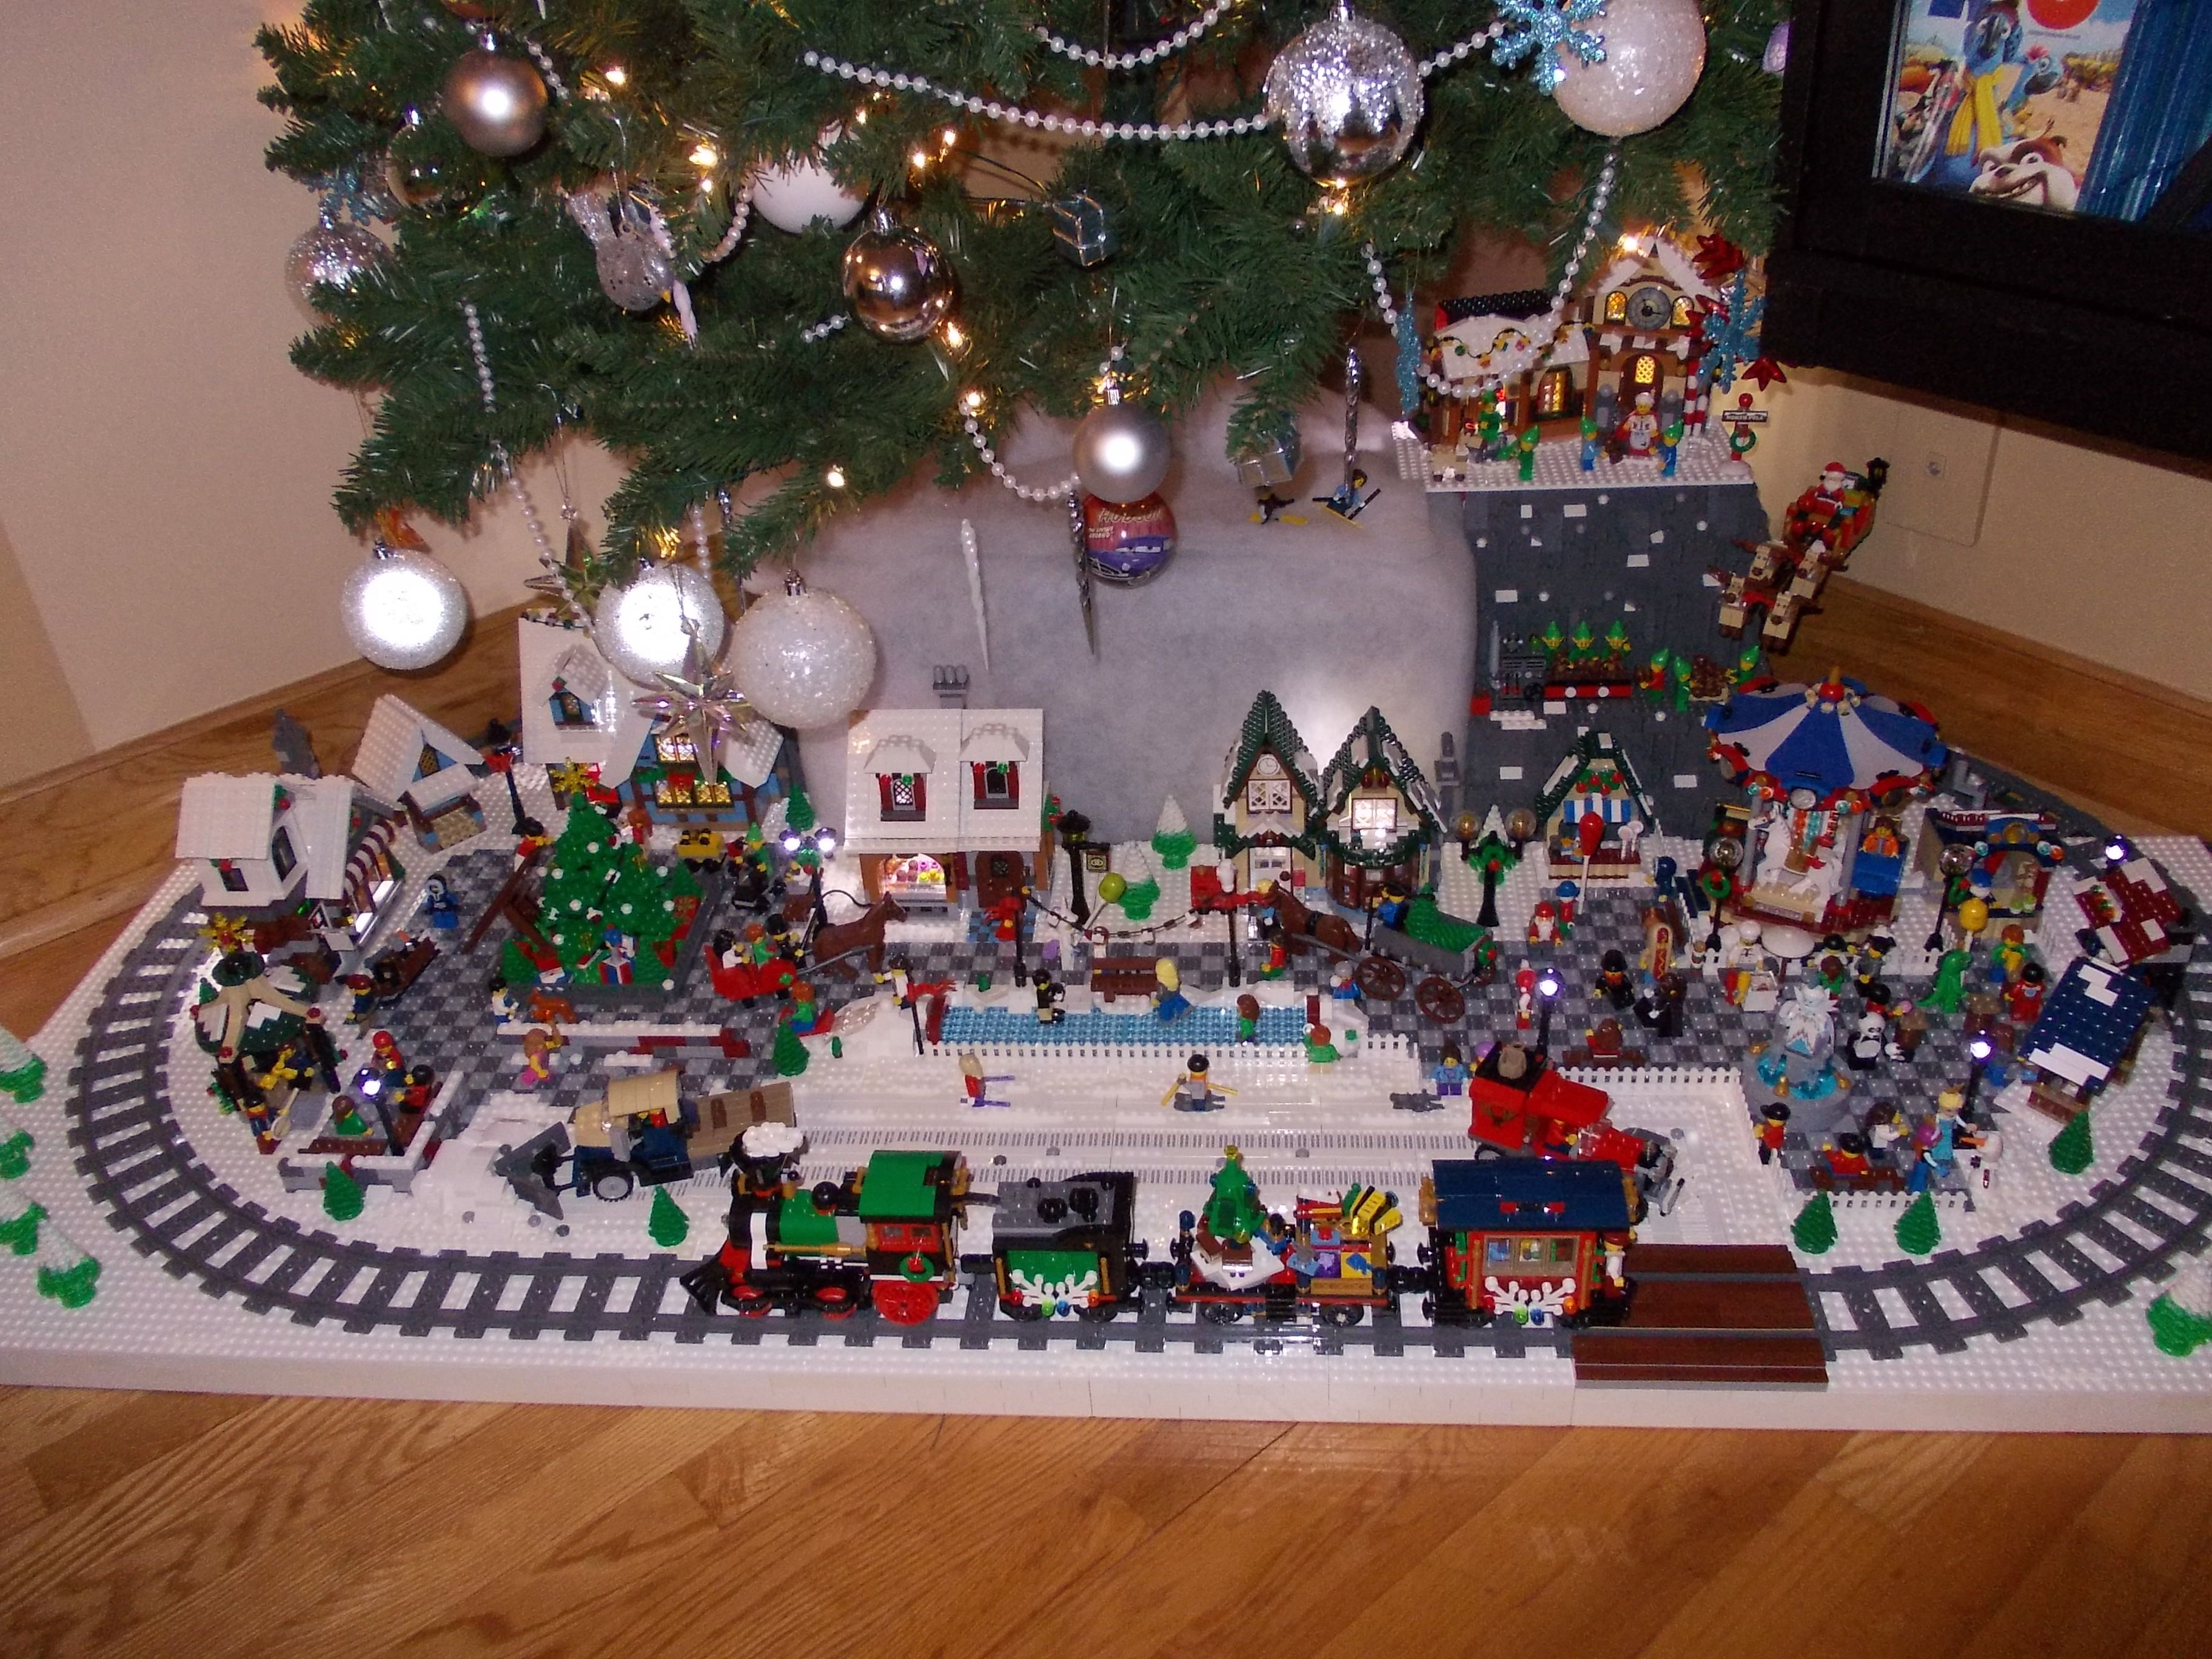 Train Sapin De Noel DSCN2933 | Lego christmas, Lego christmas village, Lego holiday train